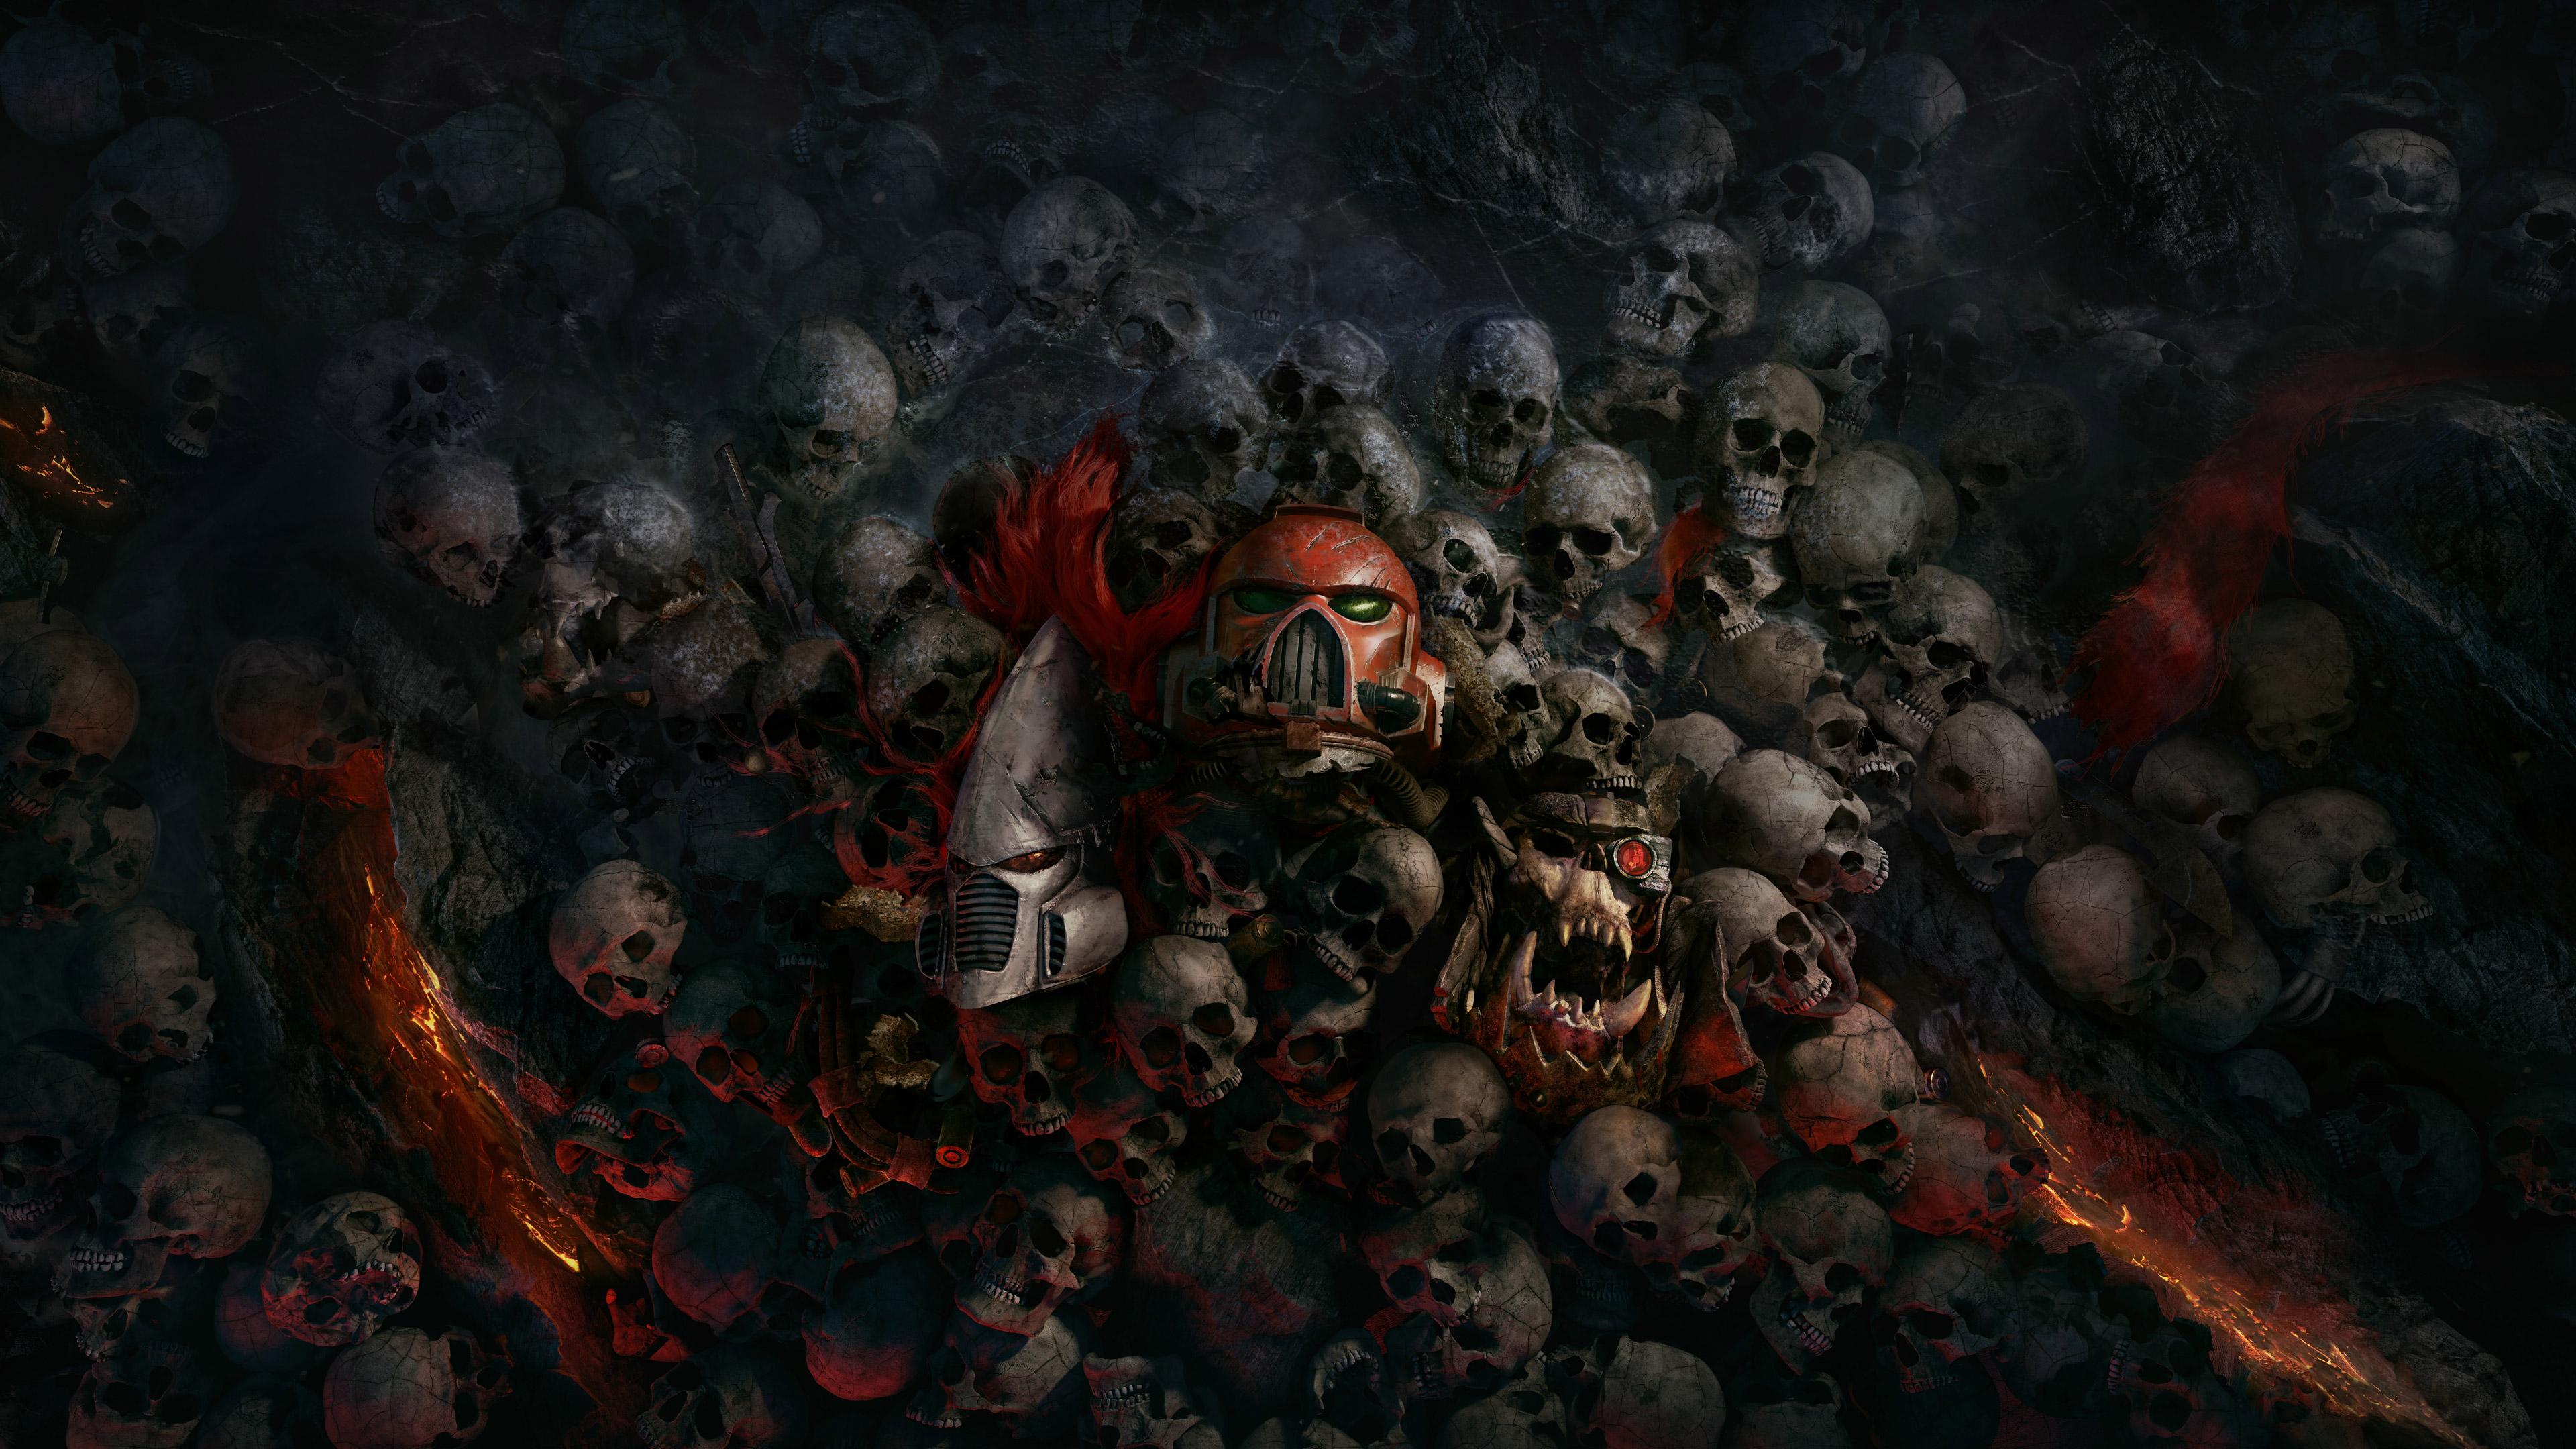 Skulls 4k Hd Others 4k Wallpapers Images Backgrounds